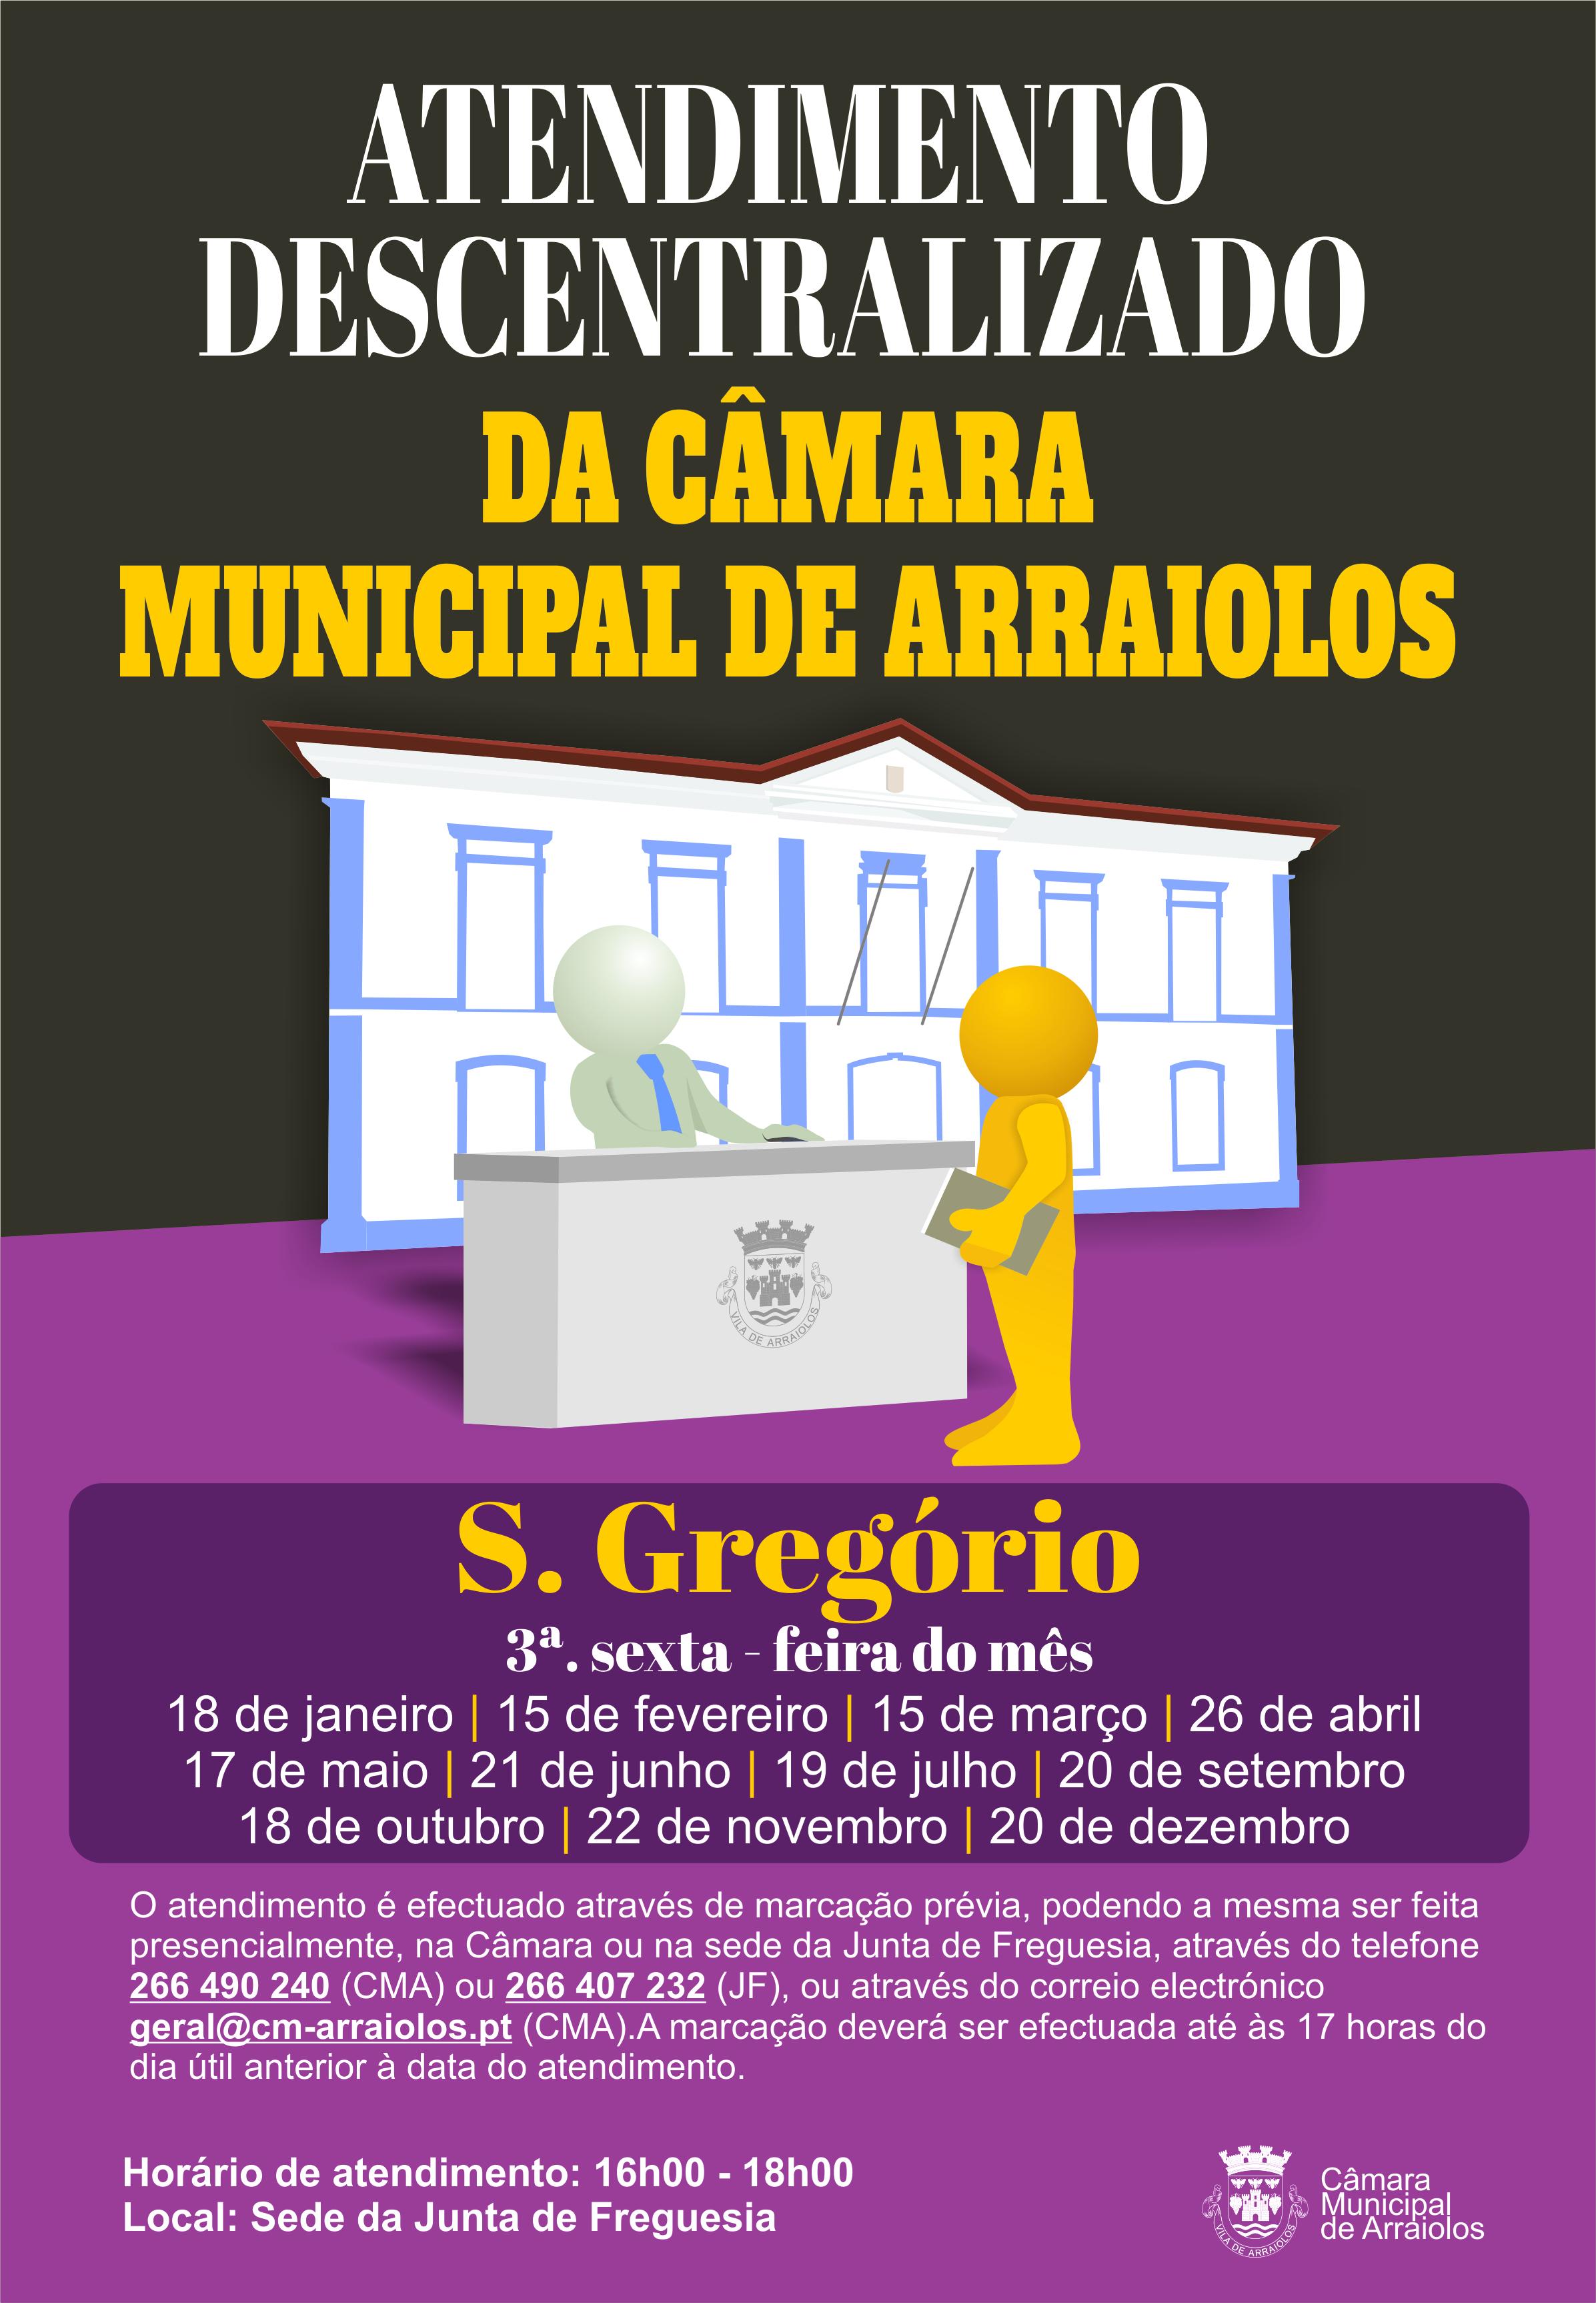 Atendimento Descentralizado 2019 S Gregório.jpg